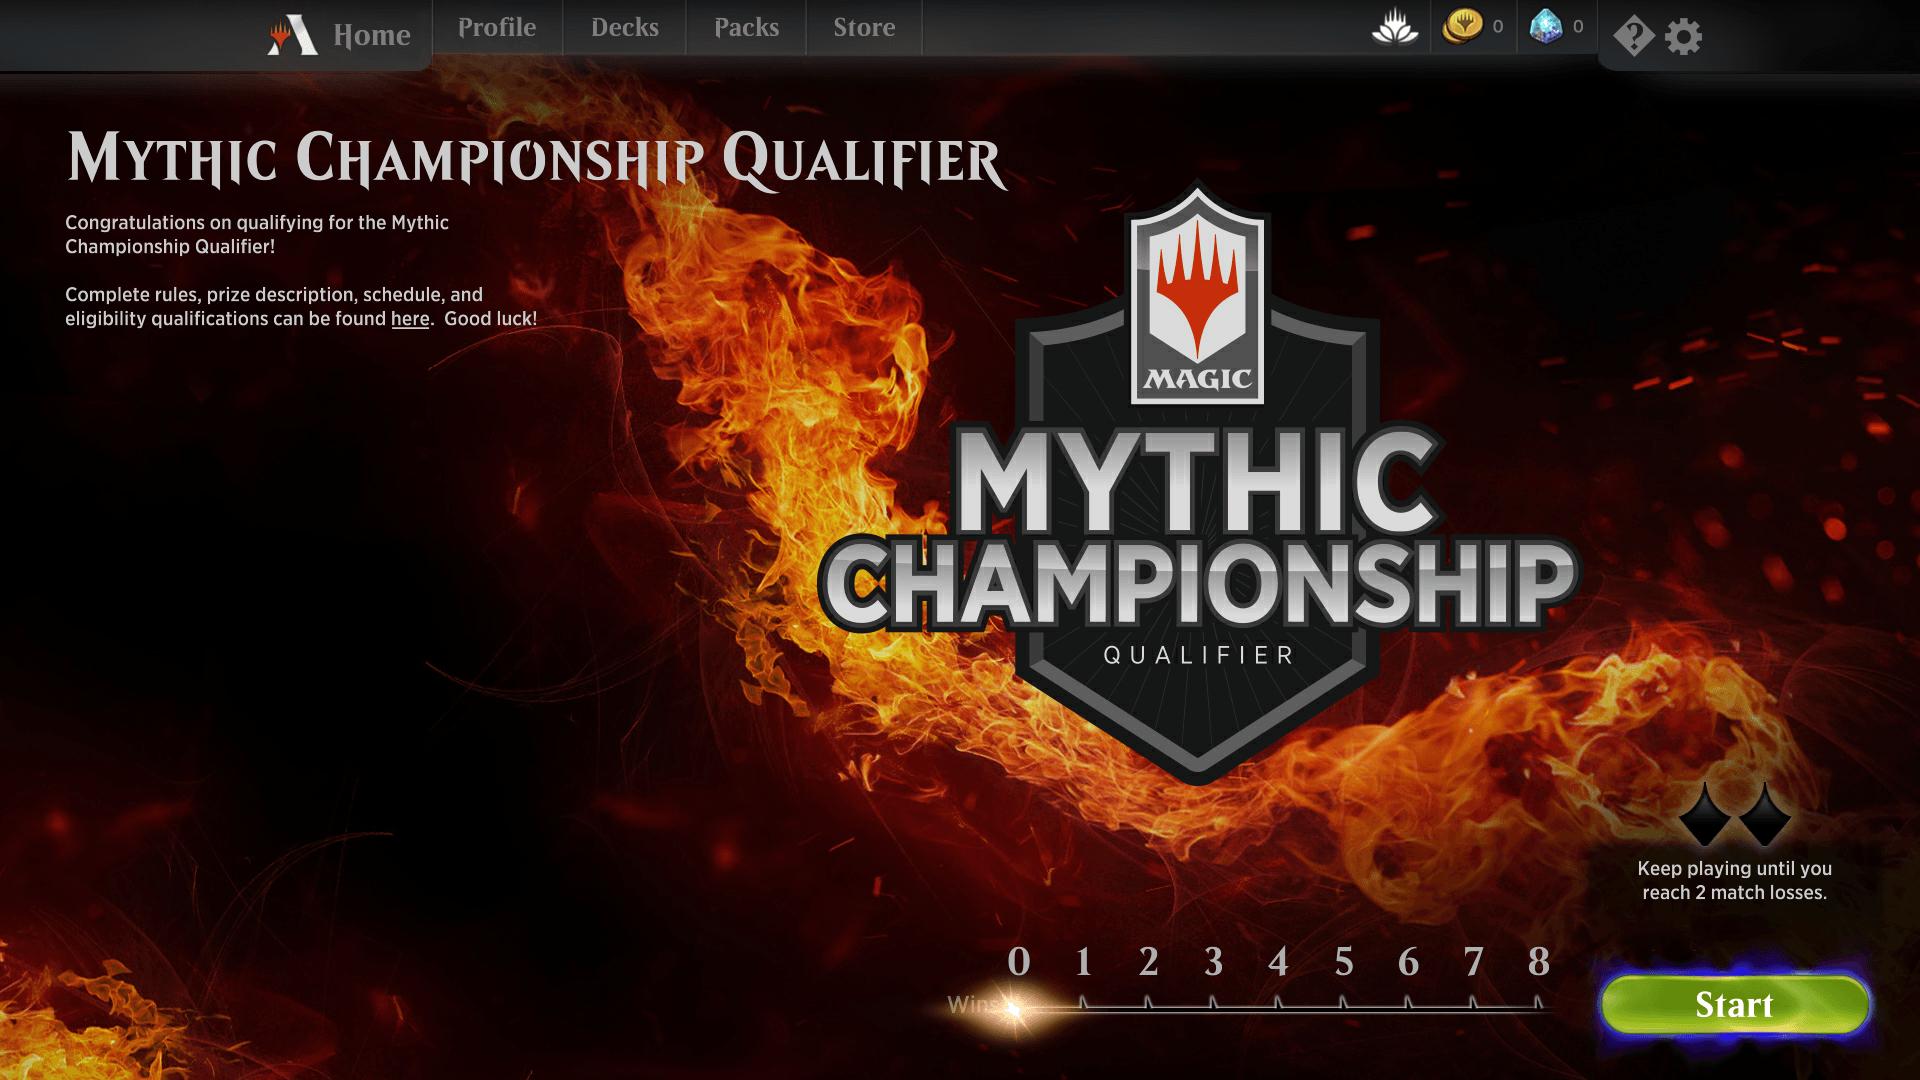 Mythic Championship Qualifier Event